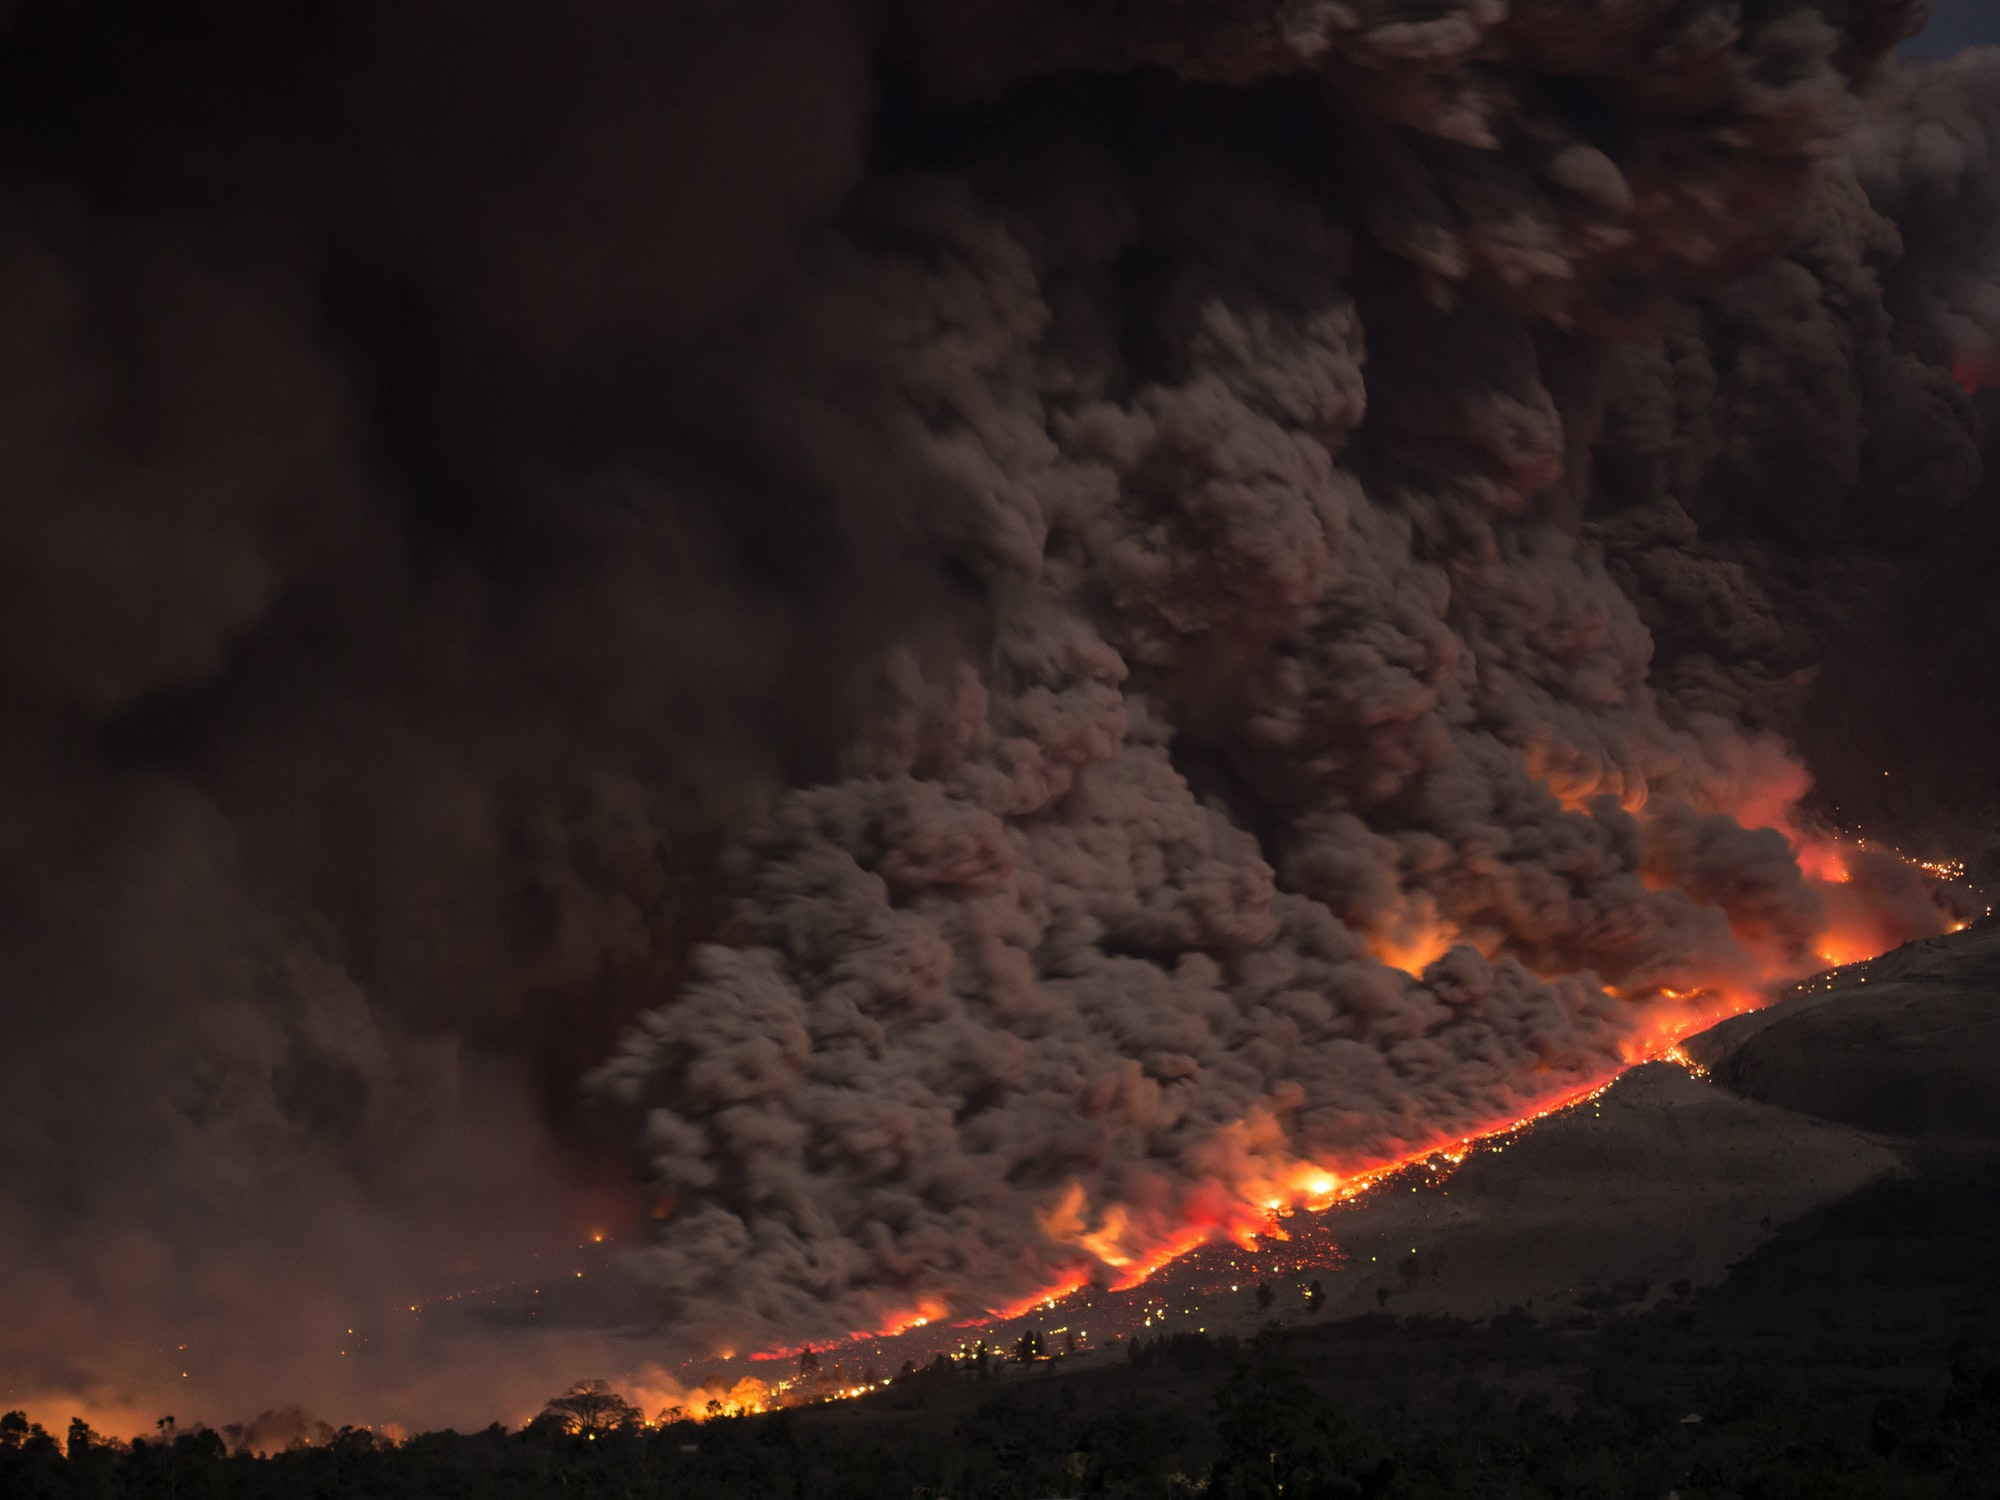 Eruption of Sinabung-volcano on Indonesian island Sumatra. Its part of an documentation on my website vulkane.net.